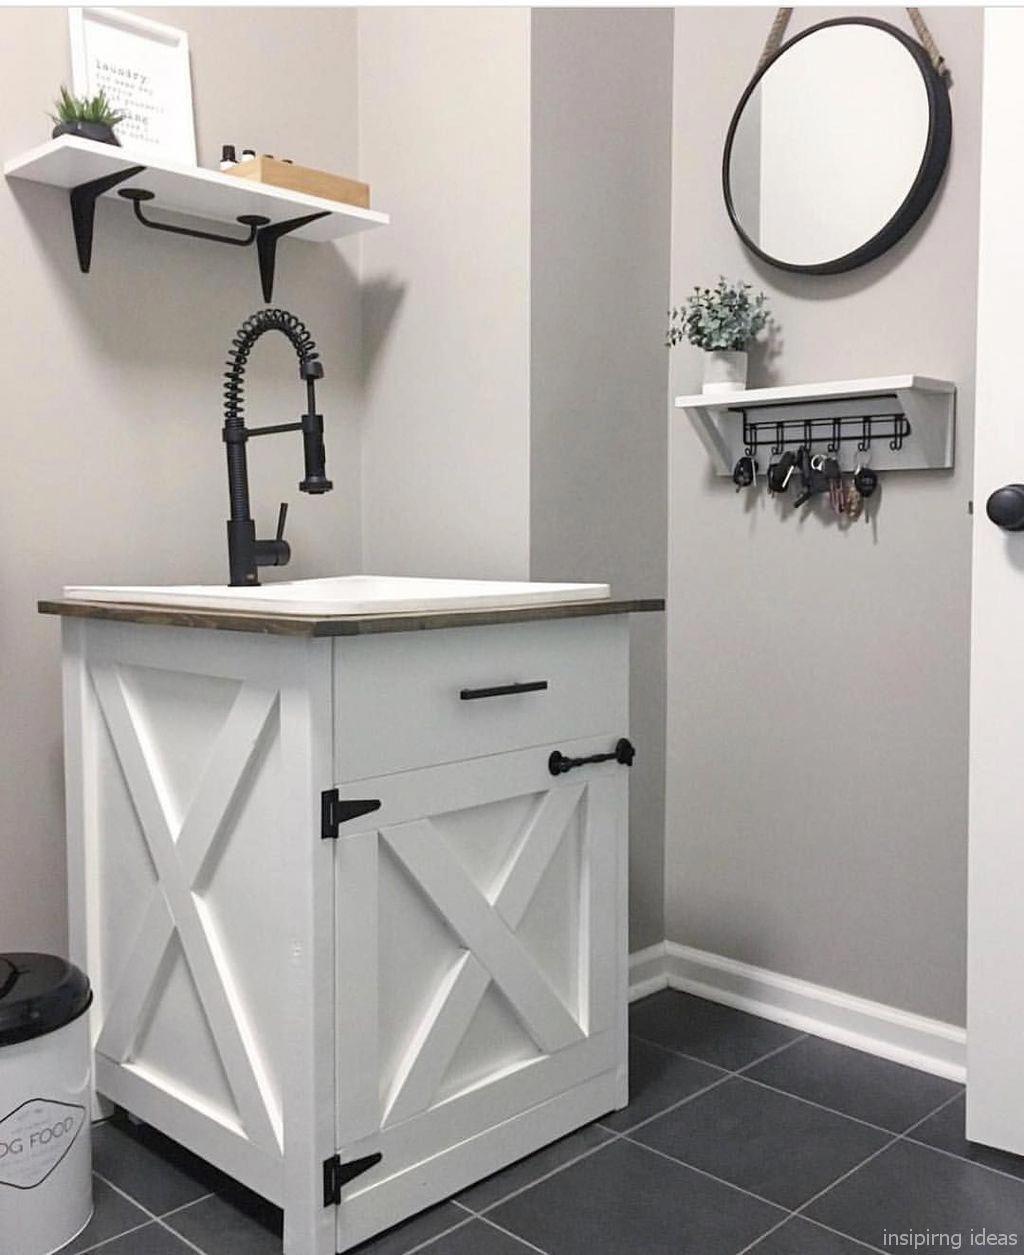 X Sunshine Modern Stainless Steel One Hook Bathroom Bedroom Door Kitchen Towel Hanger Wall Strong Stick Style Hooks For Clothes Hat Coat Robe Rustikale Bad Eitelkeiten Badezimmer Diy Badezimmer Dekor